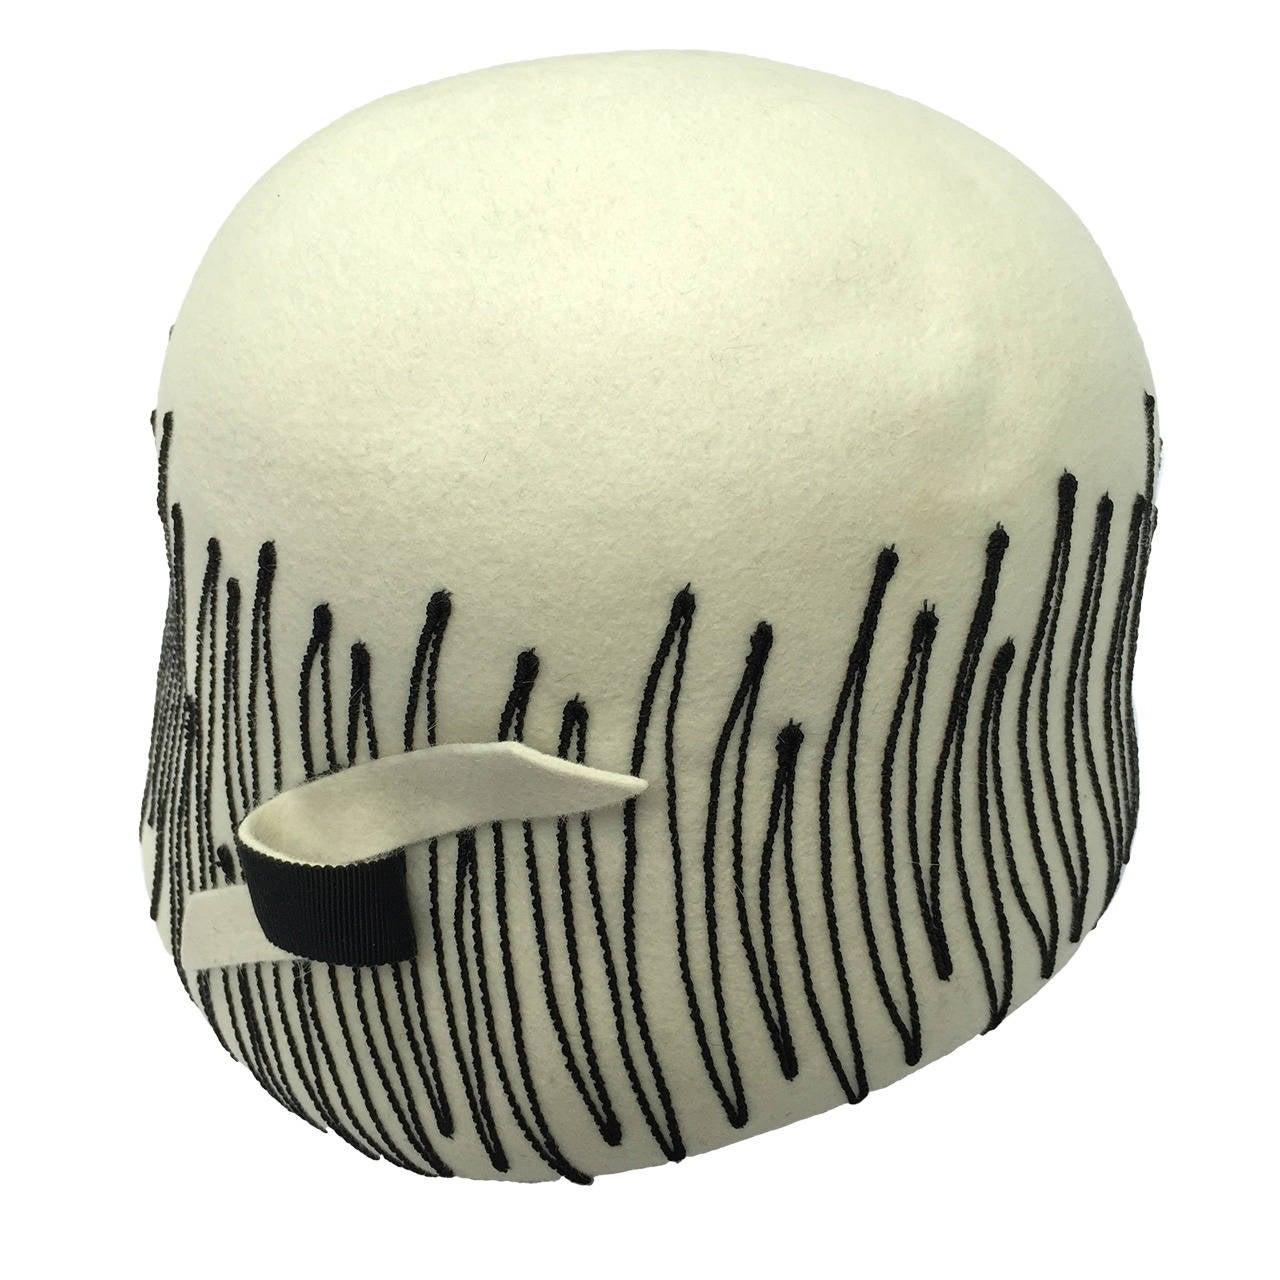 Schiaparelli Paris 50s wool felt hat. 1